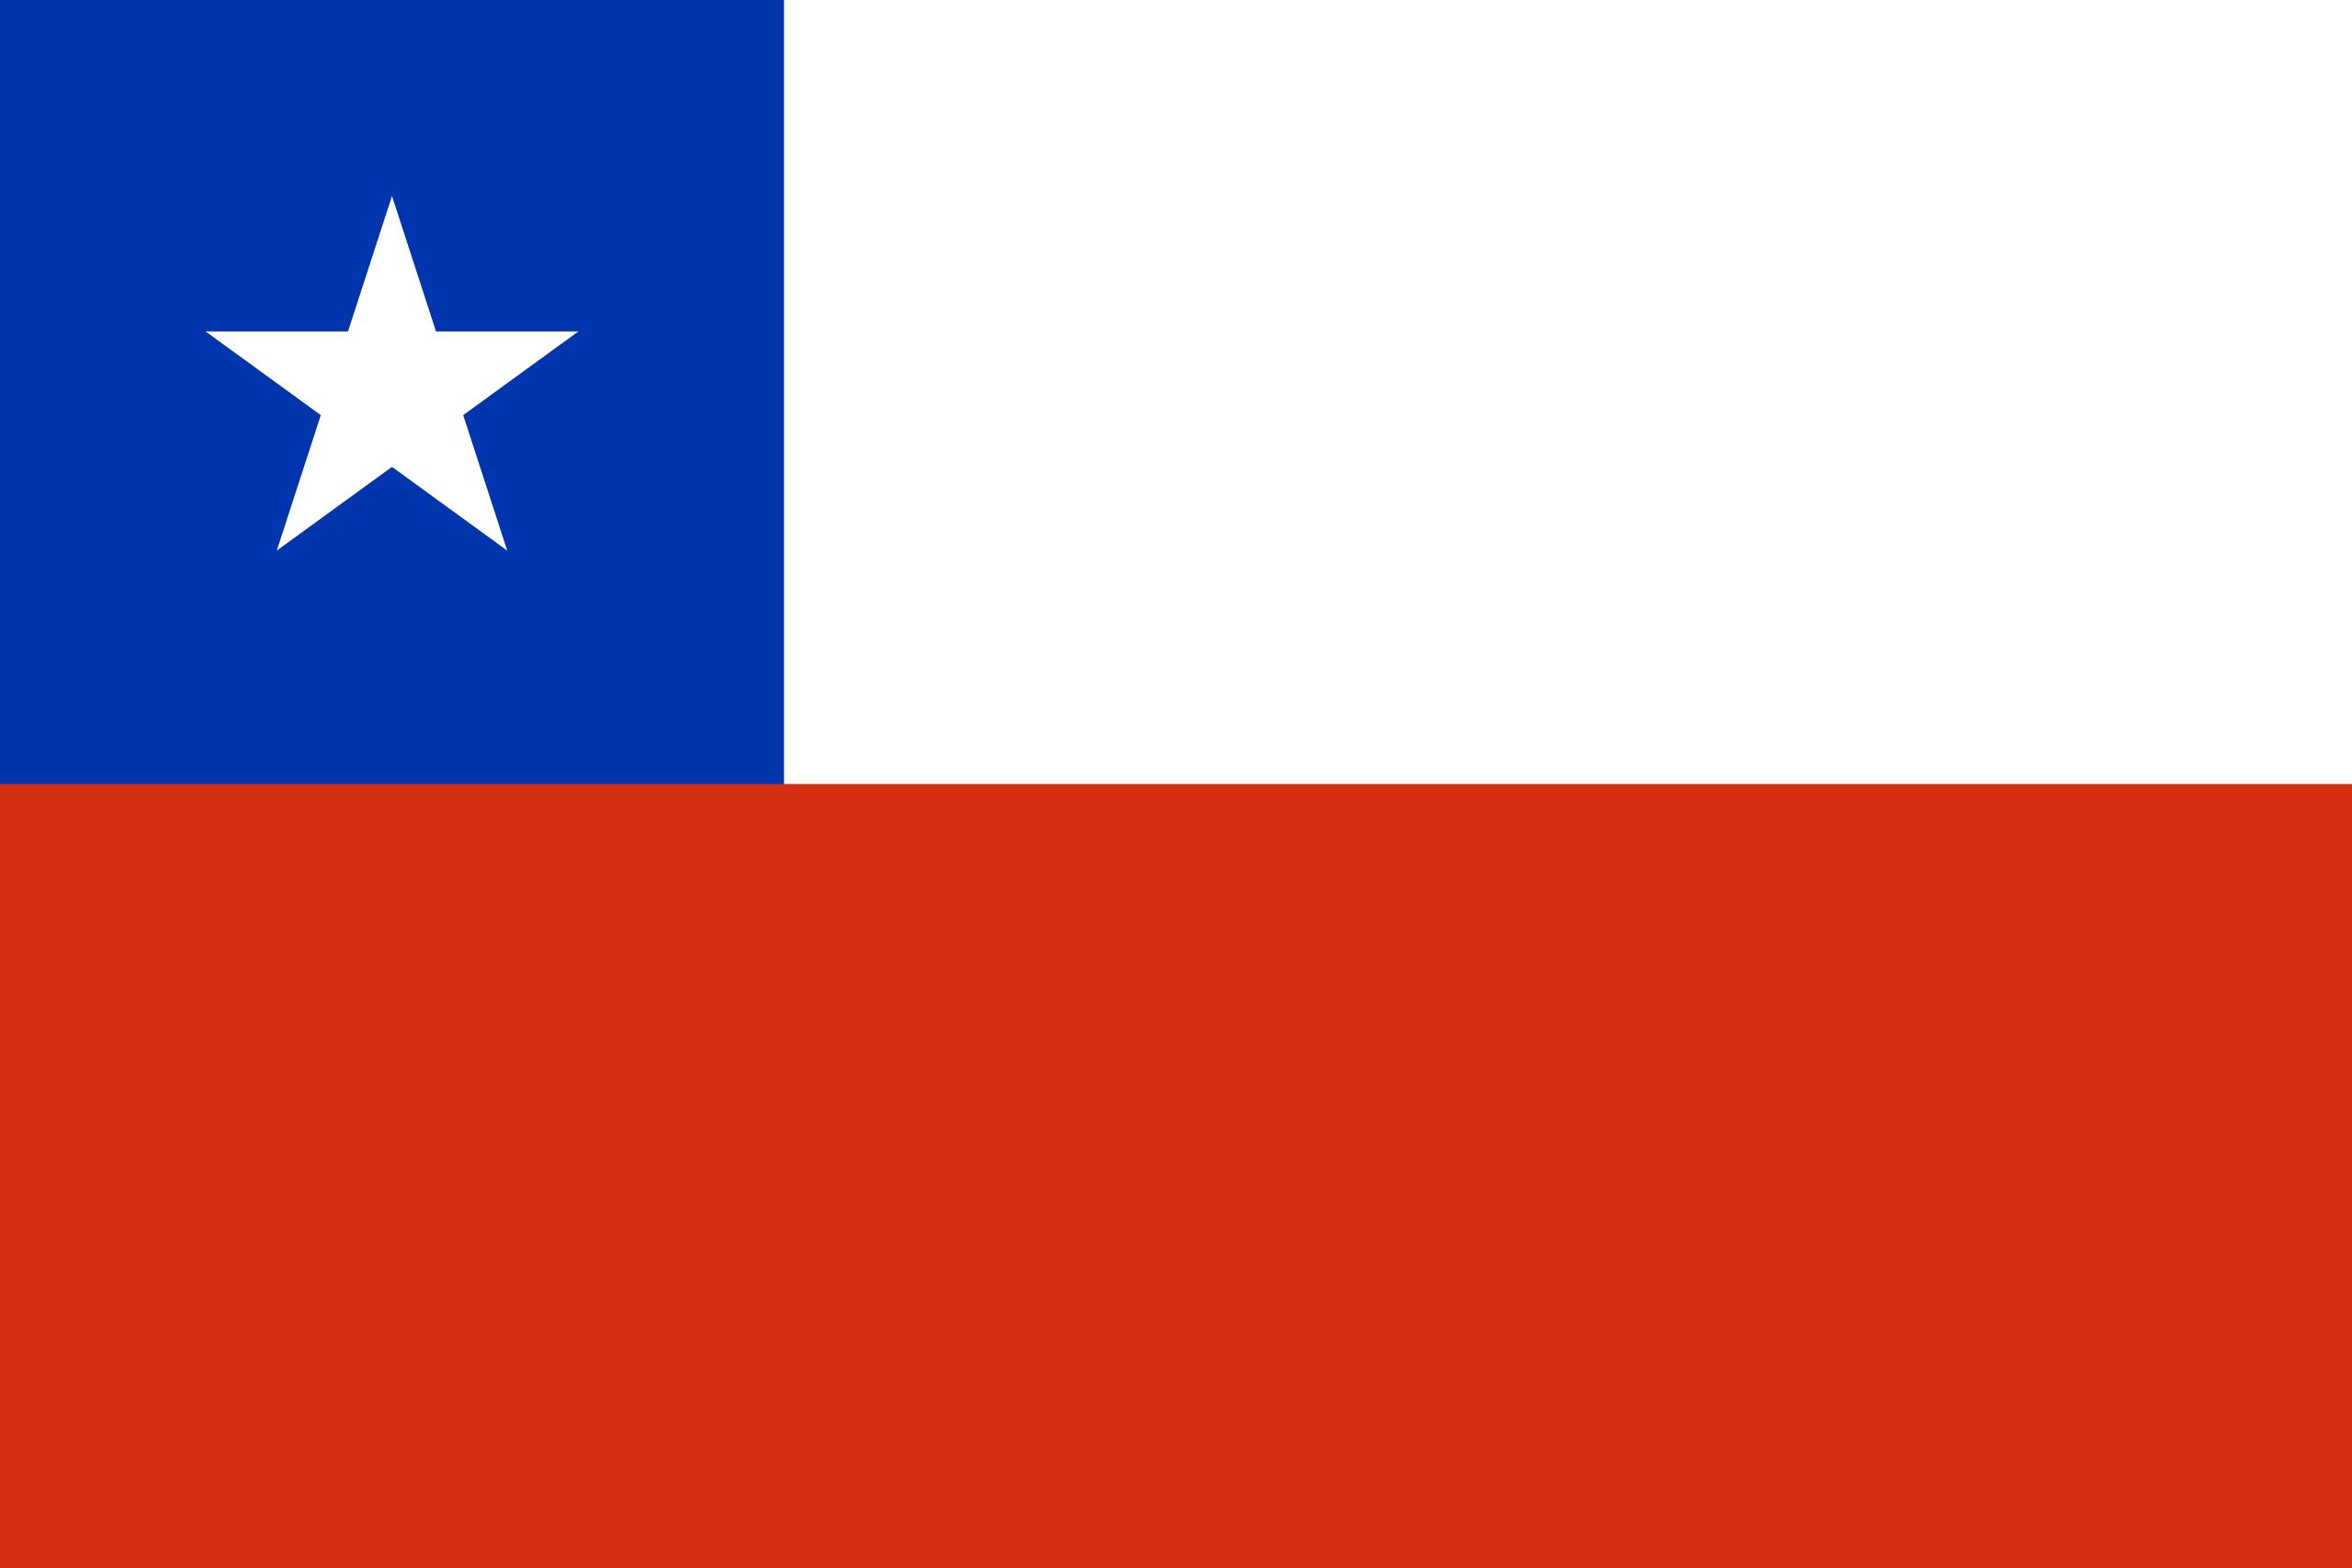 chile, Land, Emblem, Logo, Symbol - Wallpaper HD - Prof.-falken.com